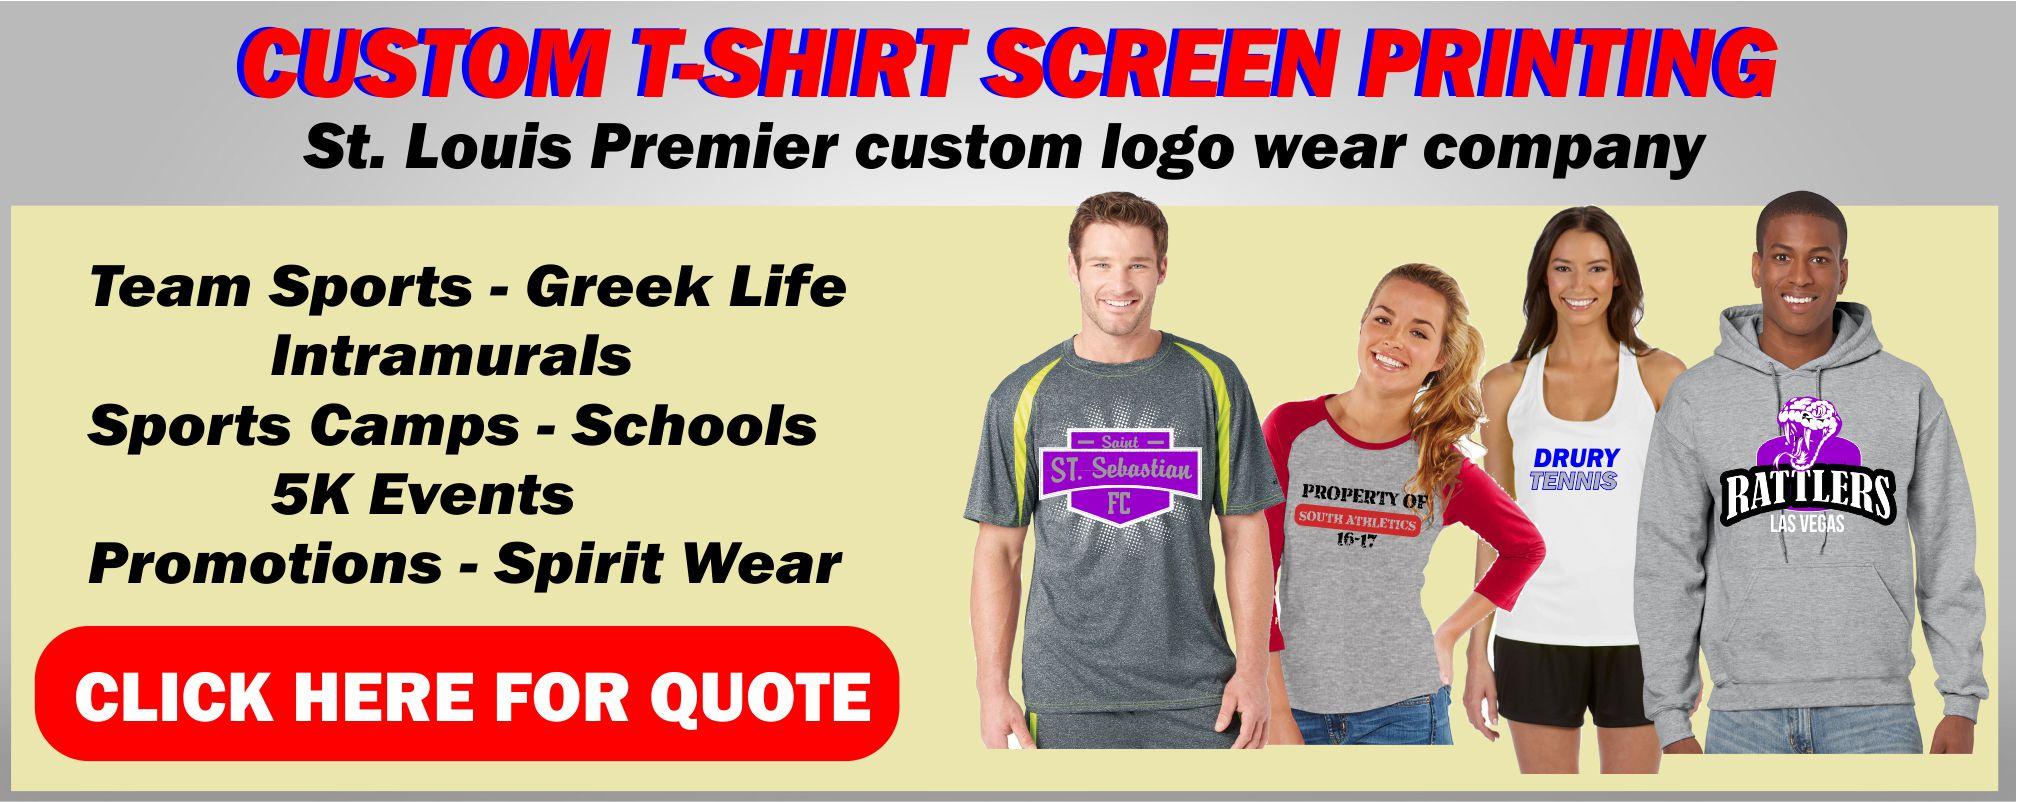 Custom t shirt screen printing st louis kirkwood trading for St louis t shirt printing